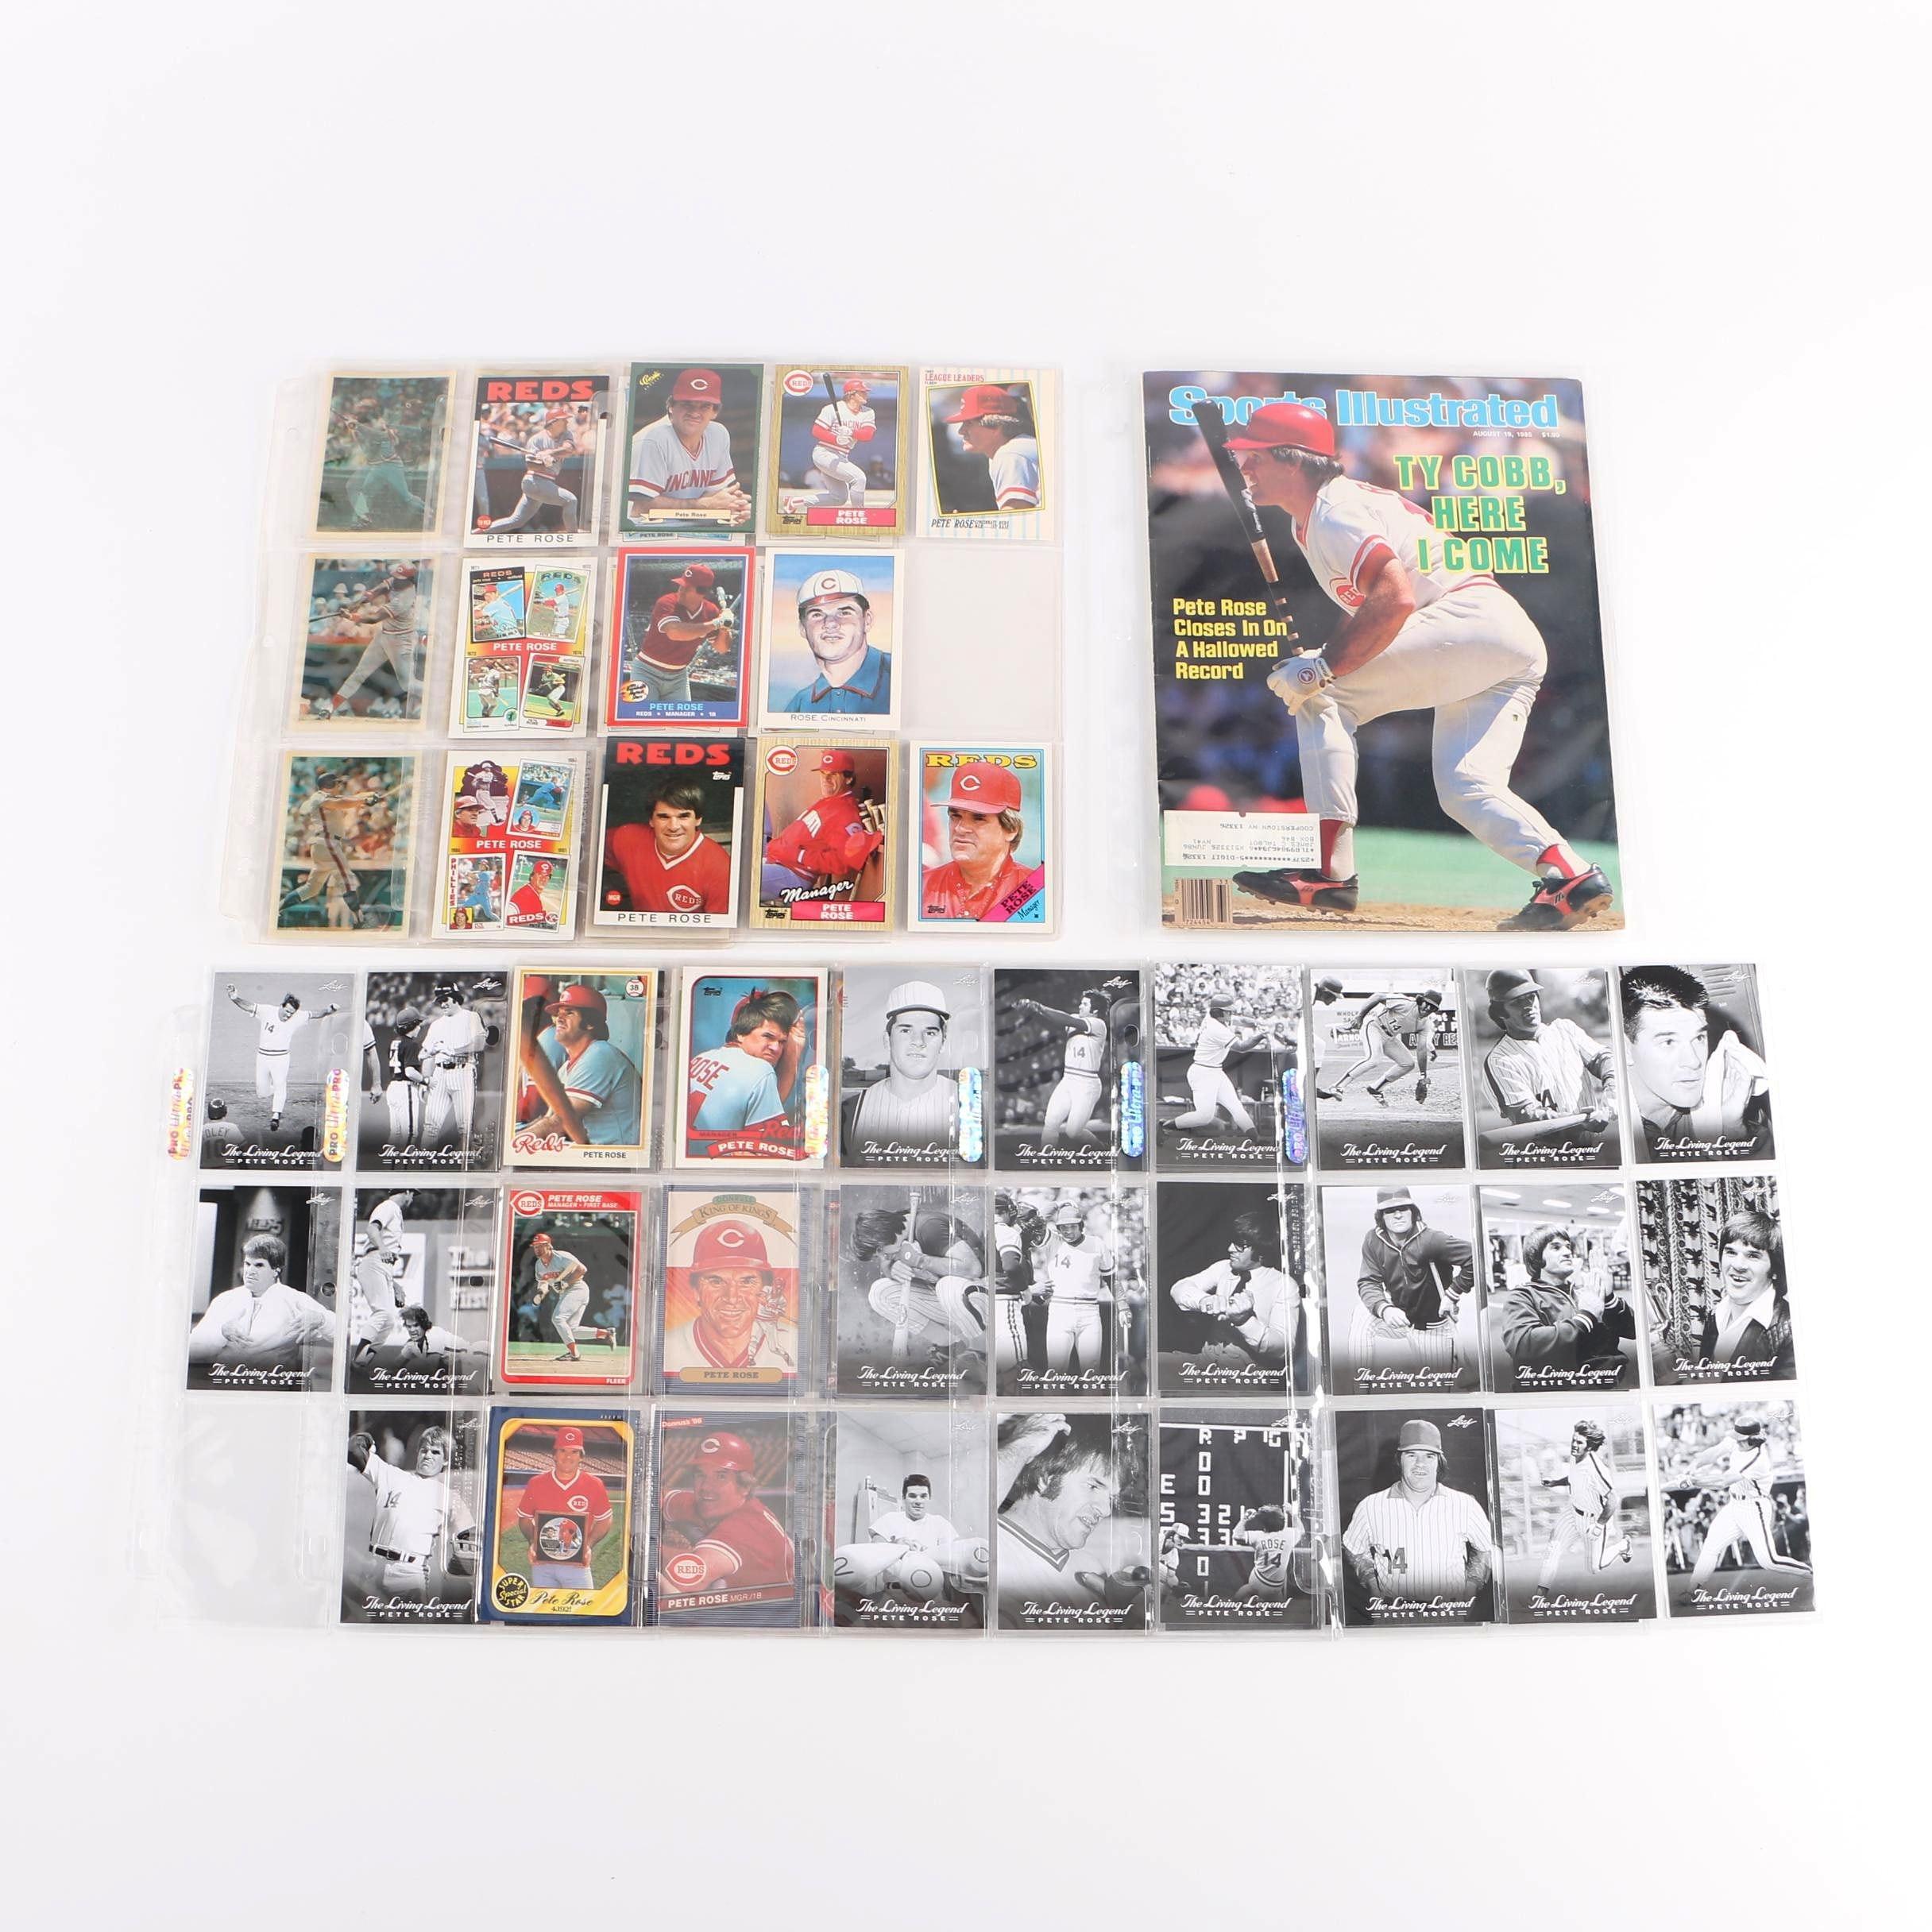 Collection of Pete Rose Memorabilia